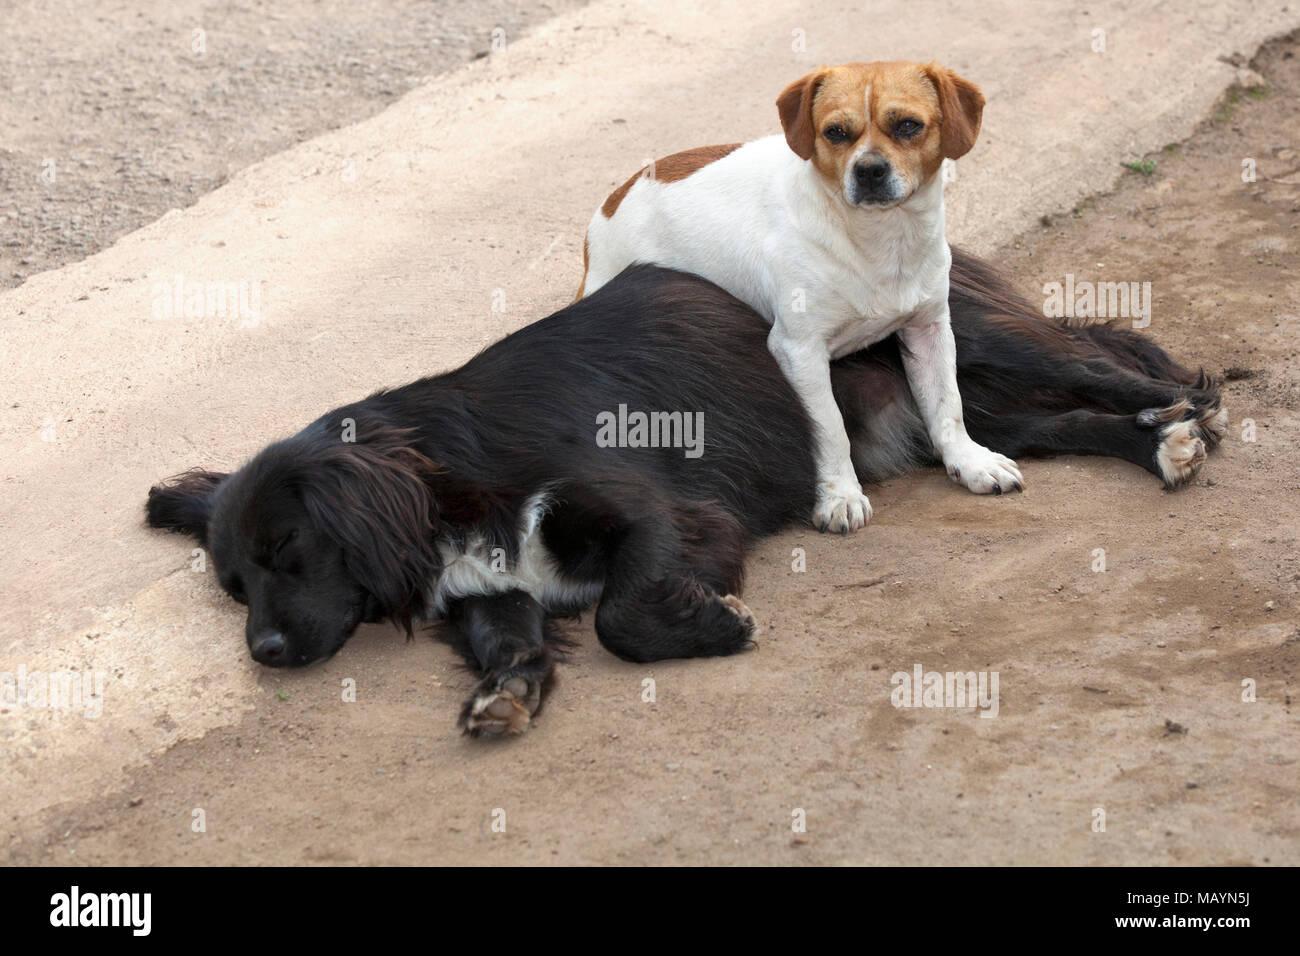 Small dog standing over sleeping big dog sleeping in the street - Stock Image